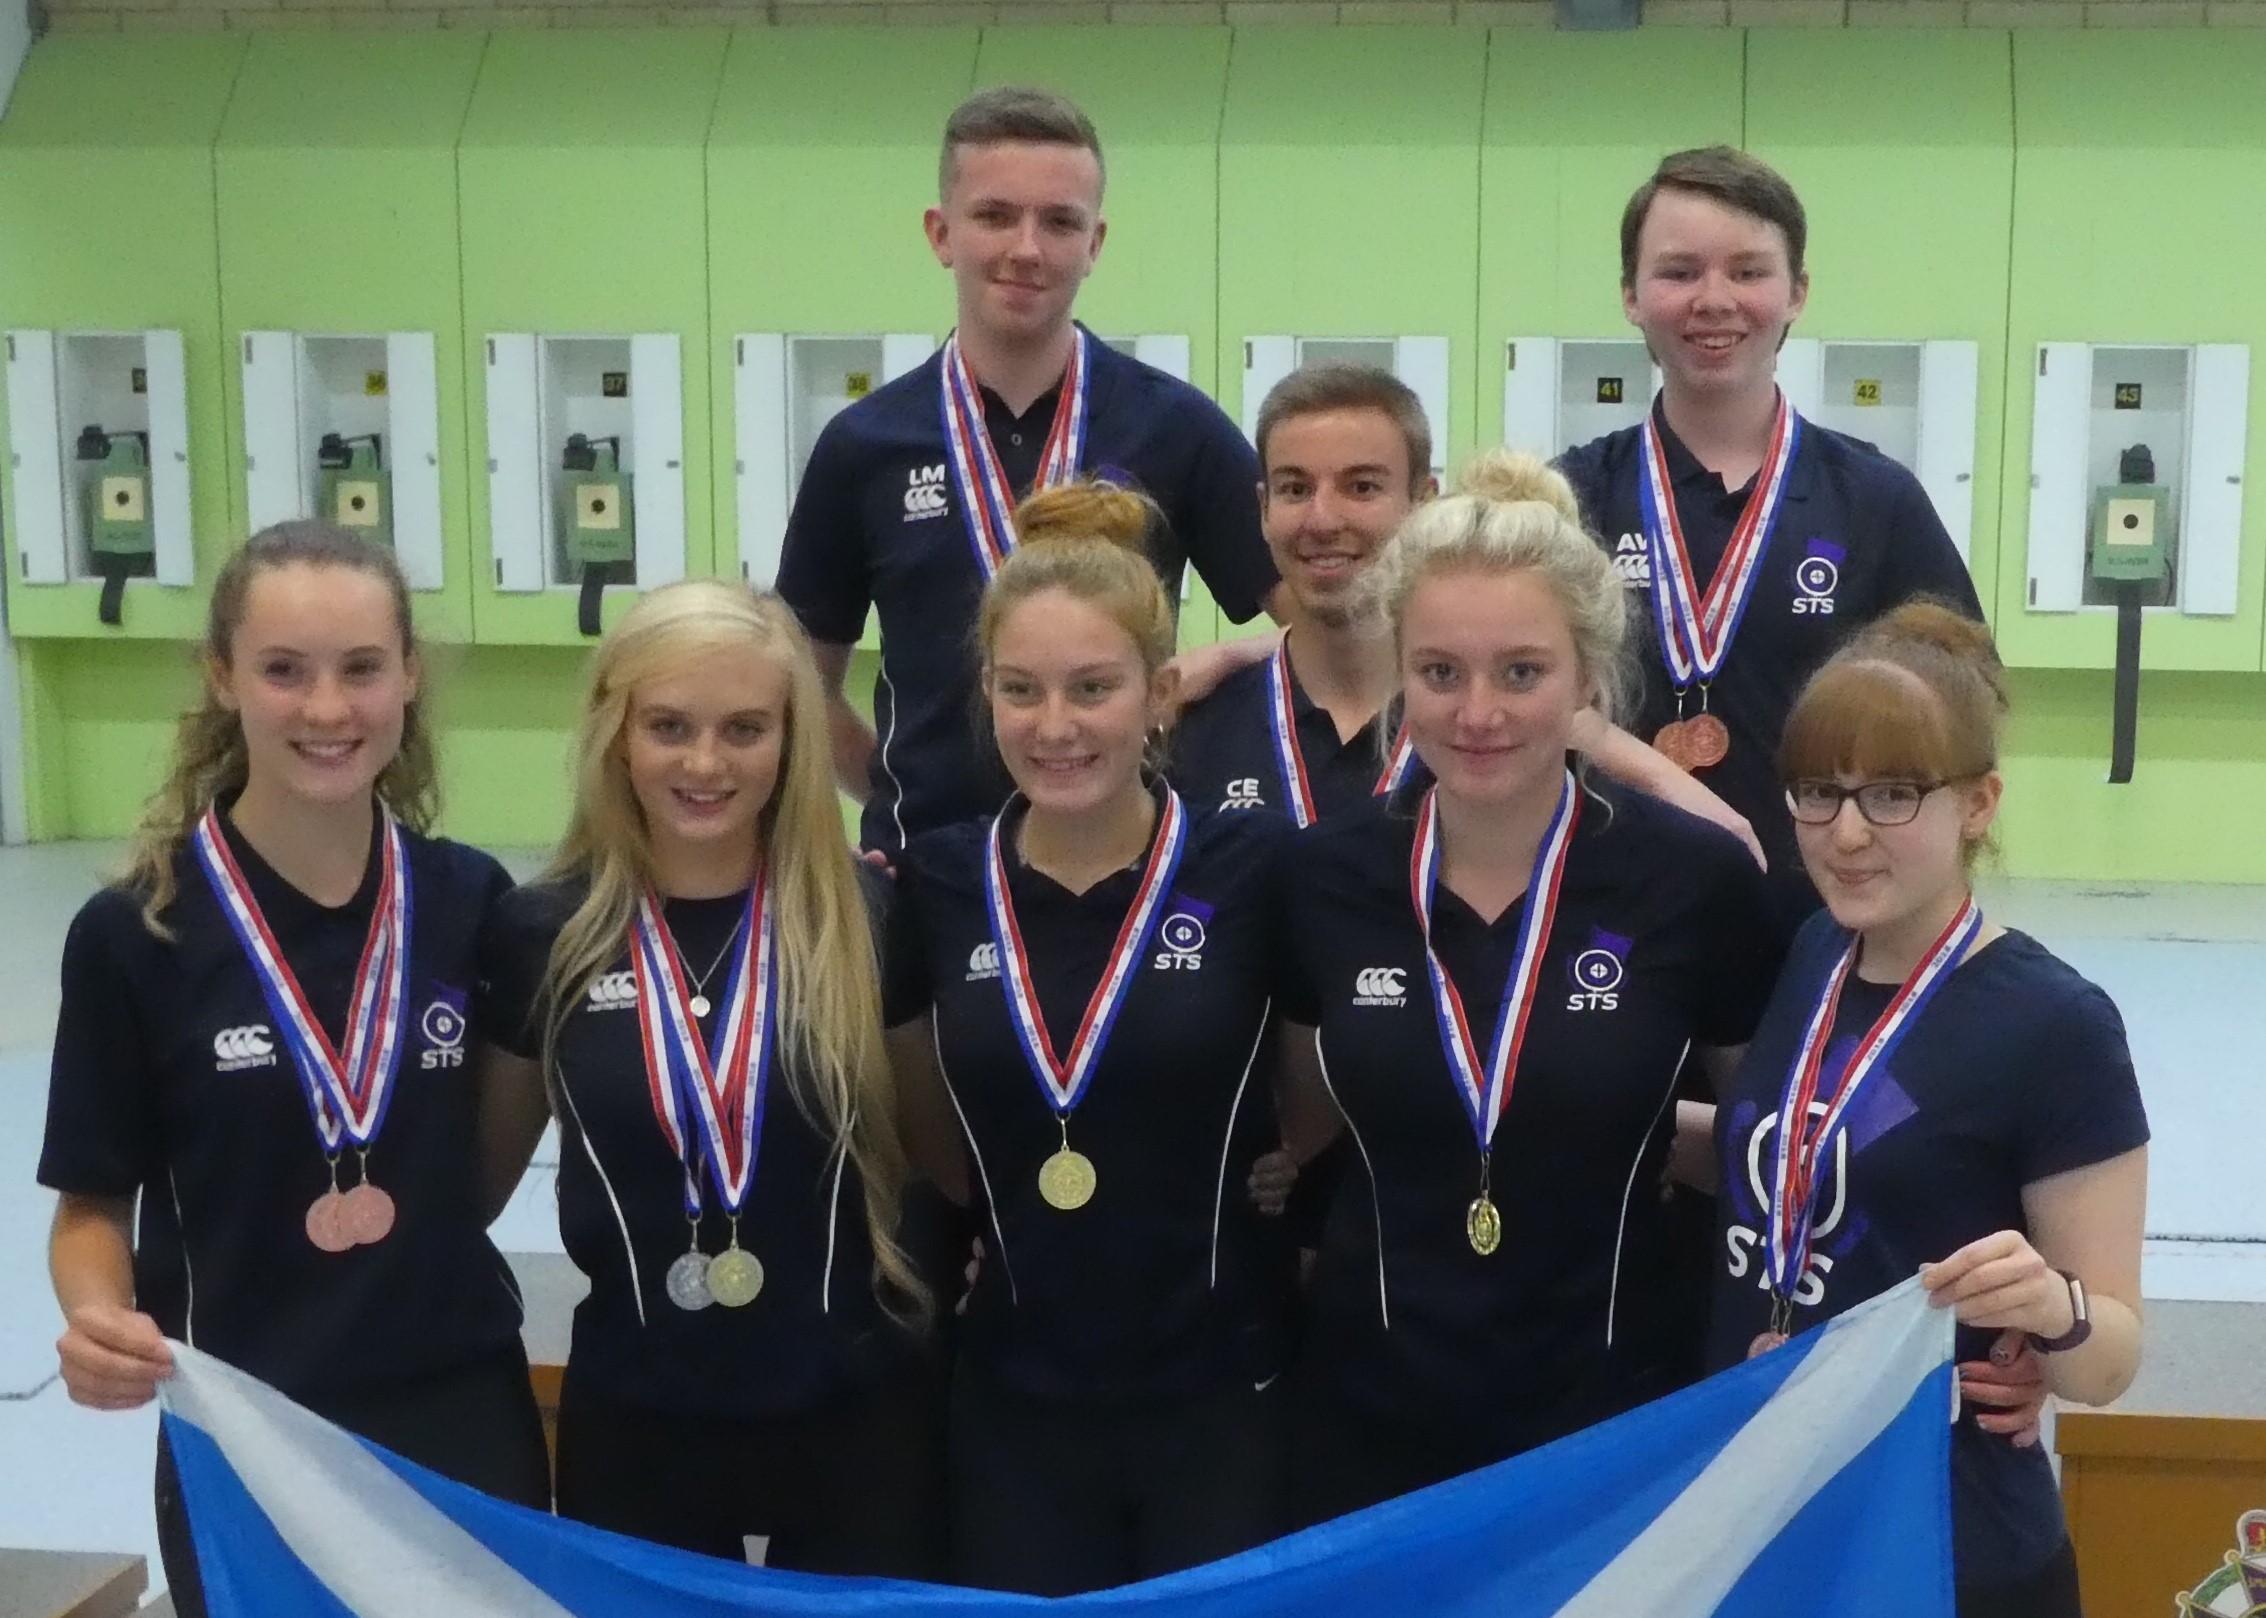 Congratulations everyone in the 2018 Junior International Scottish Team